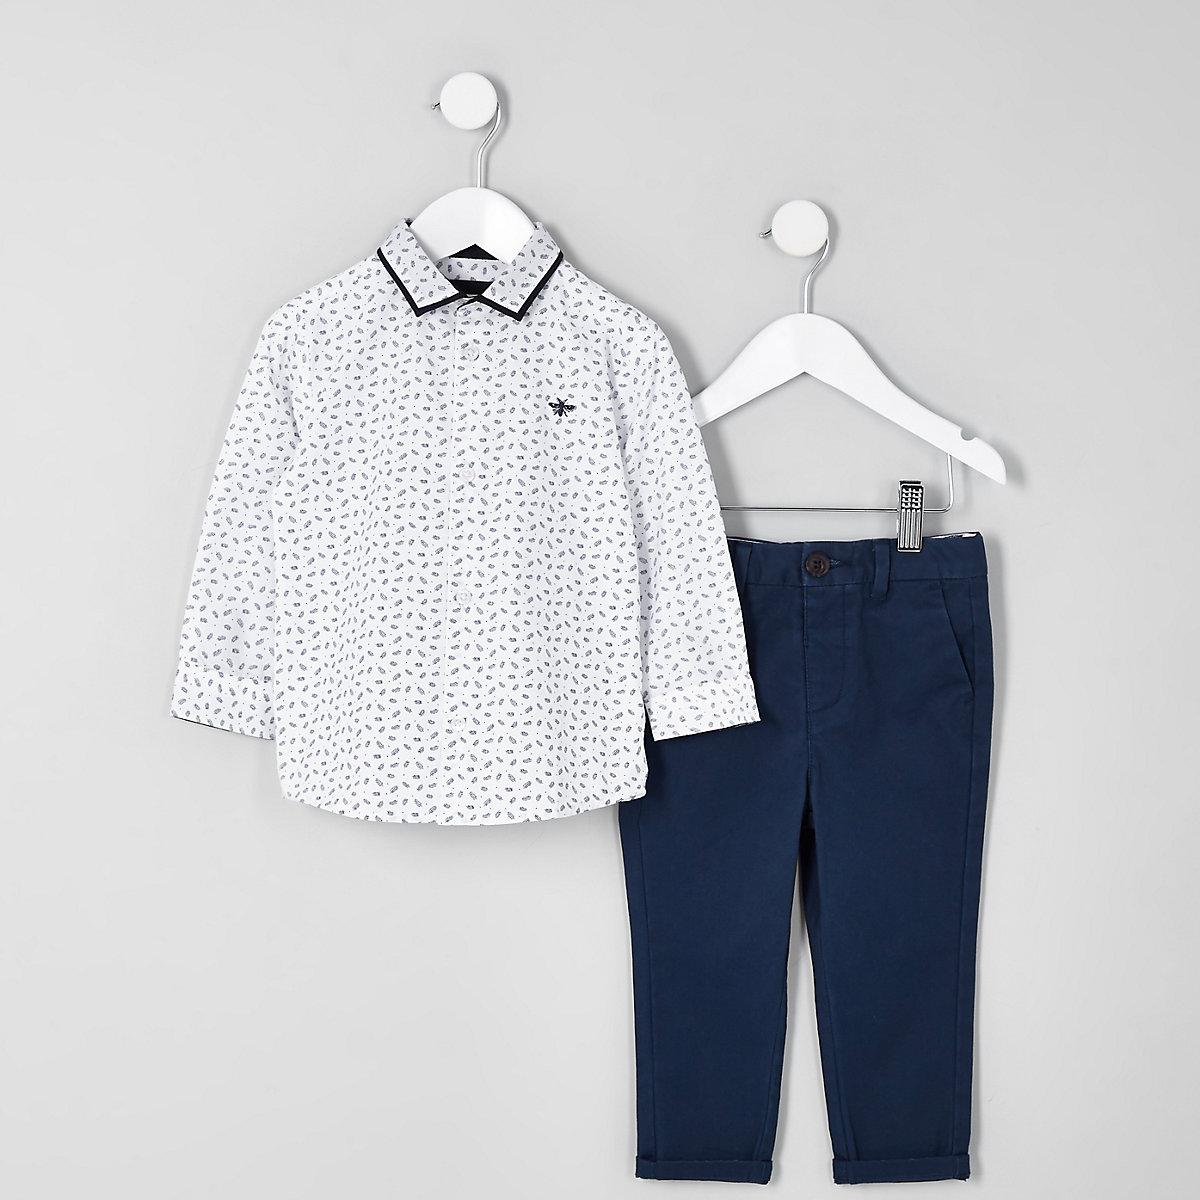 Mini boys white ditsy print shirt outfit